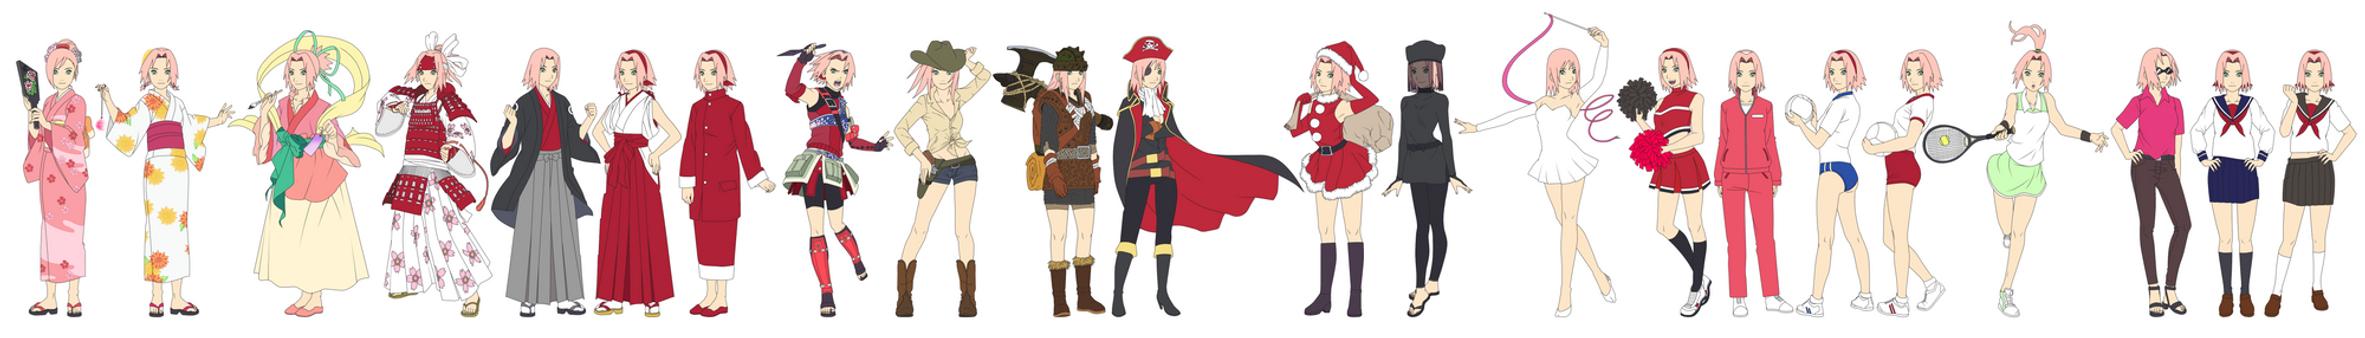 Sakura Haruno Outfit Color NARUTO SHIPPUUDEN 02 by SunakiSabakuno